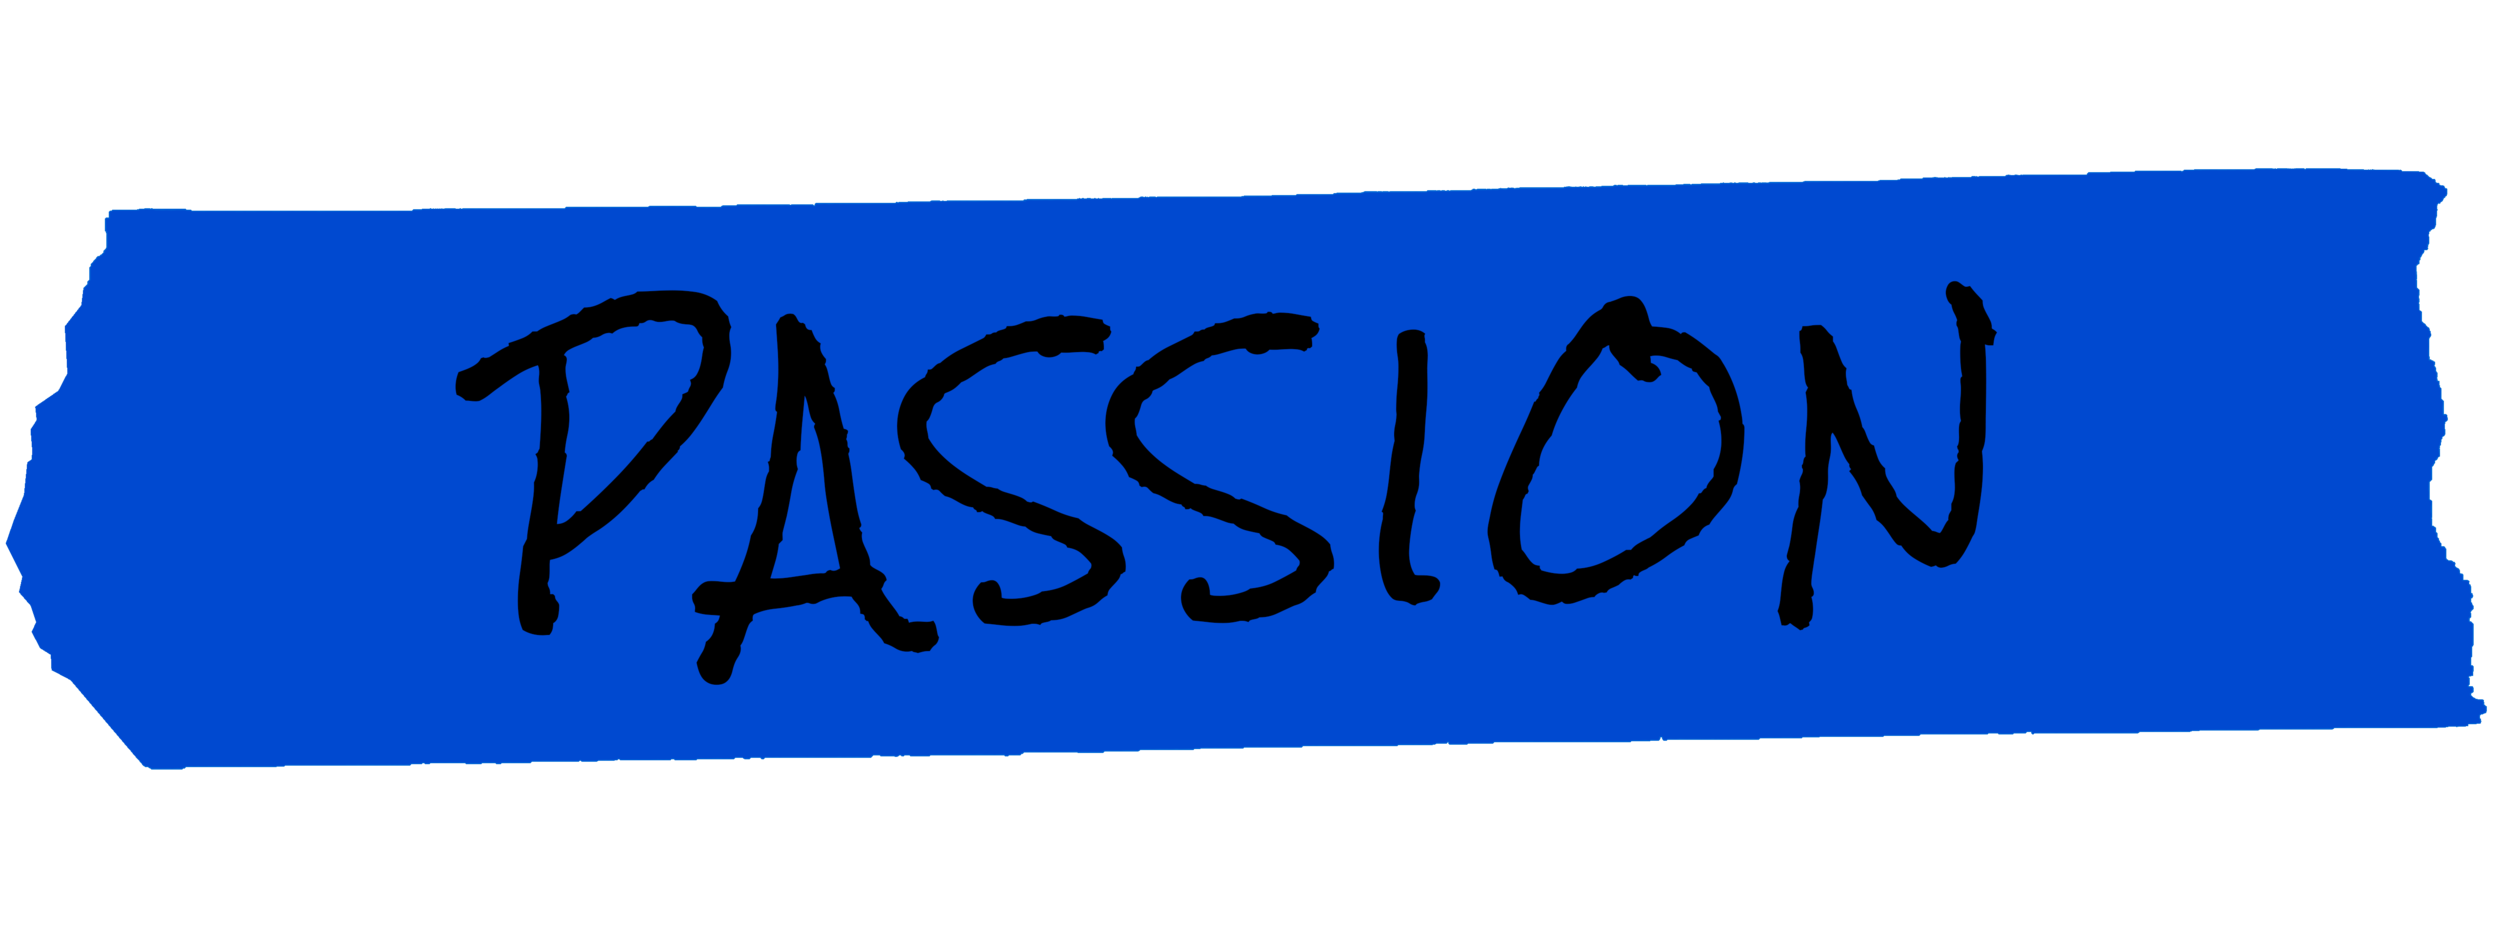 PassionFINAL.png